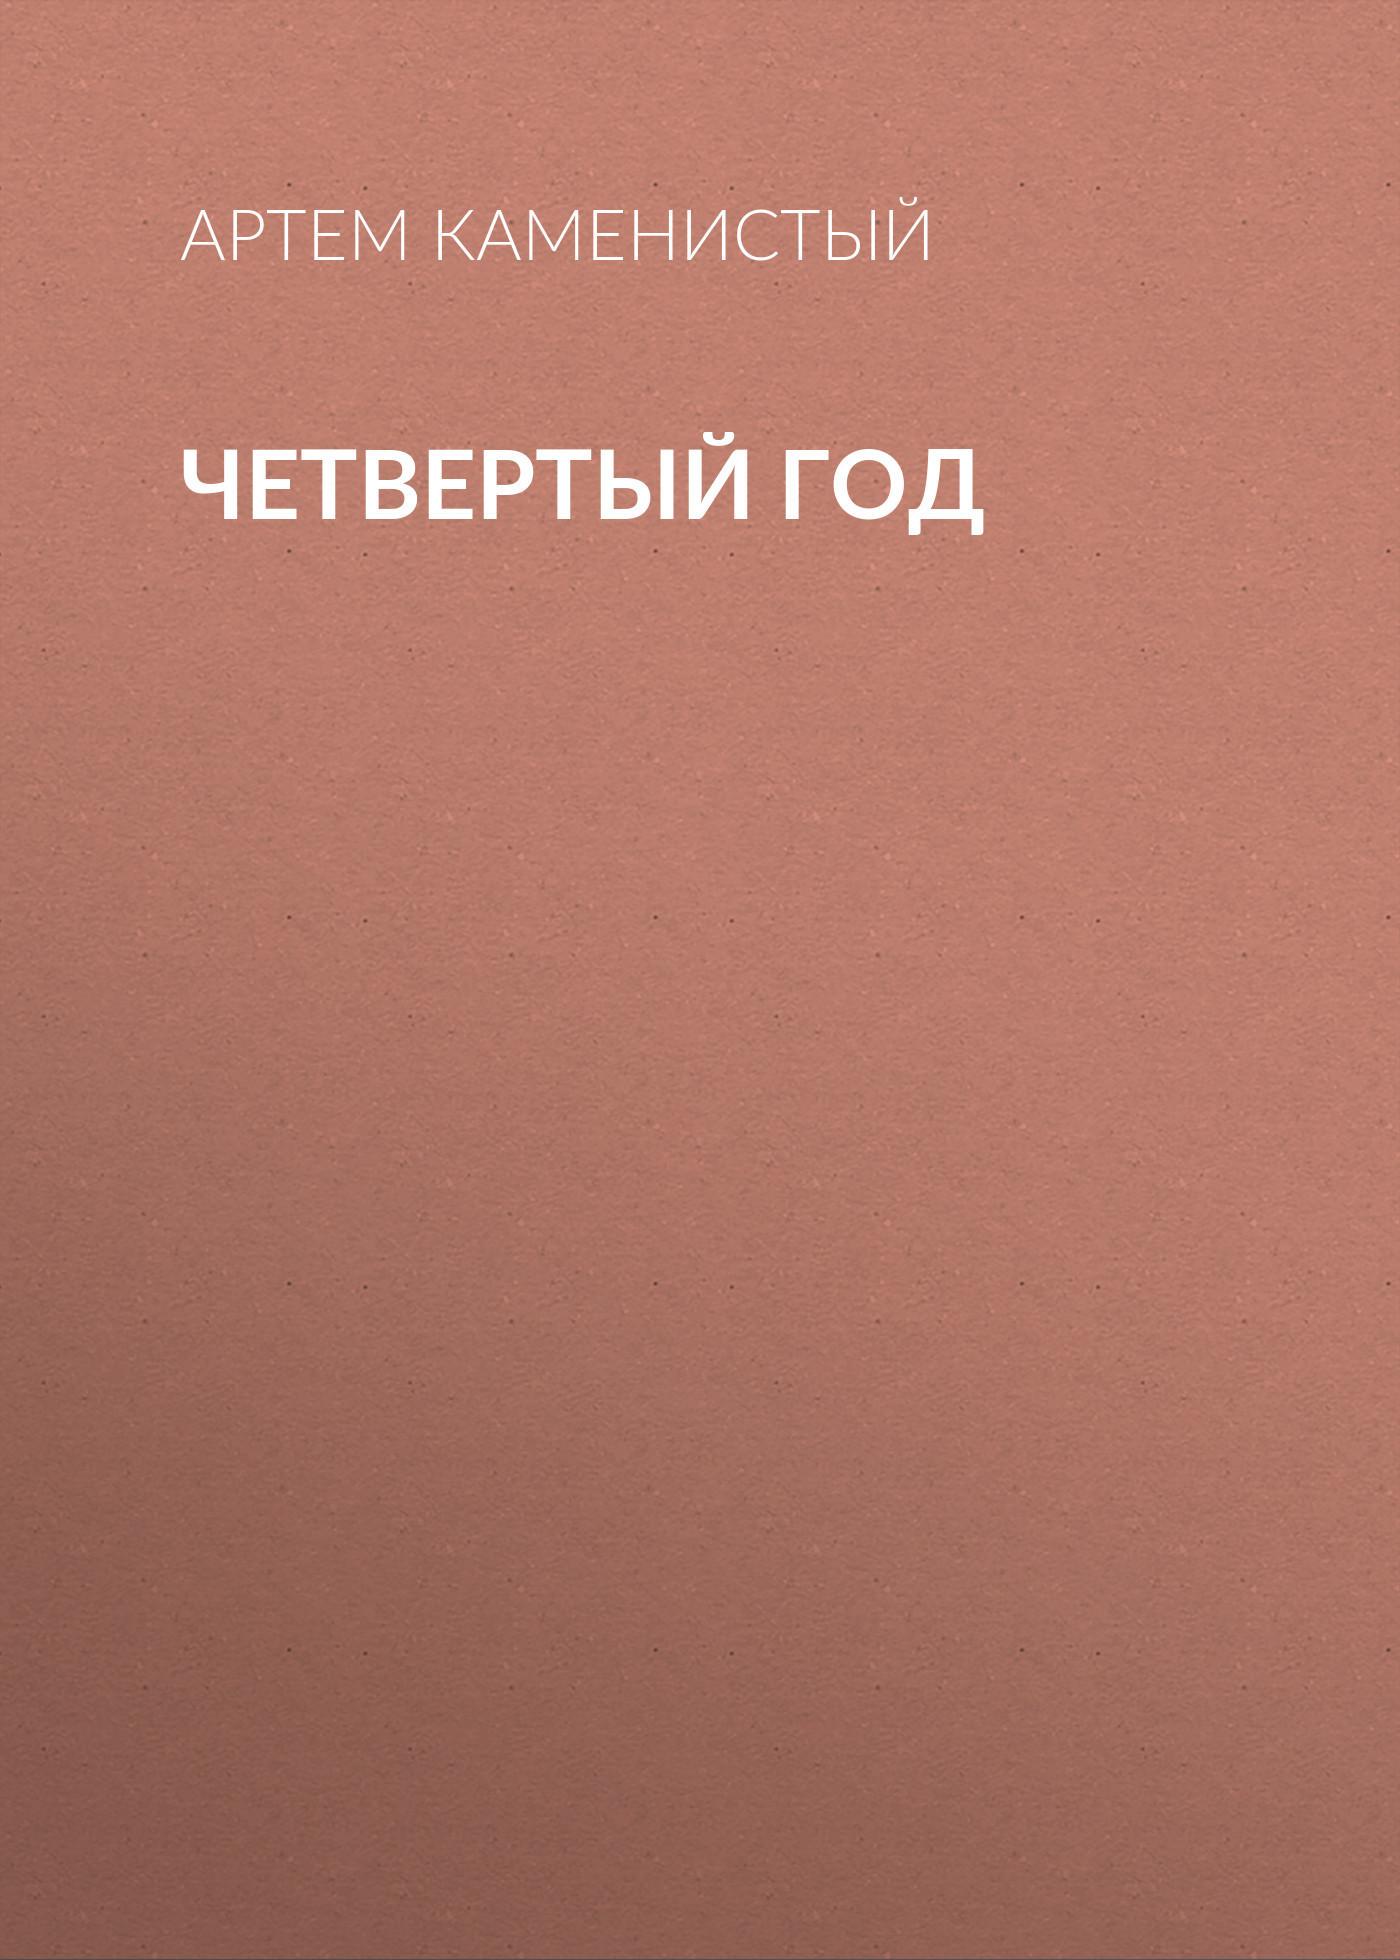 Артем Каменистый Четвертый год